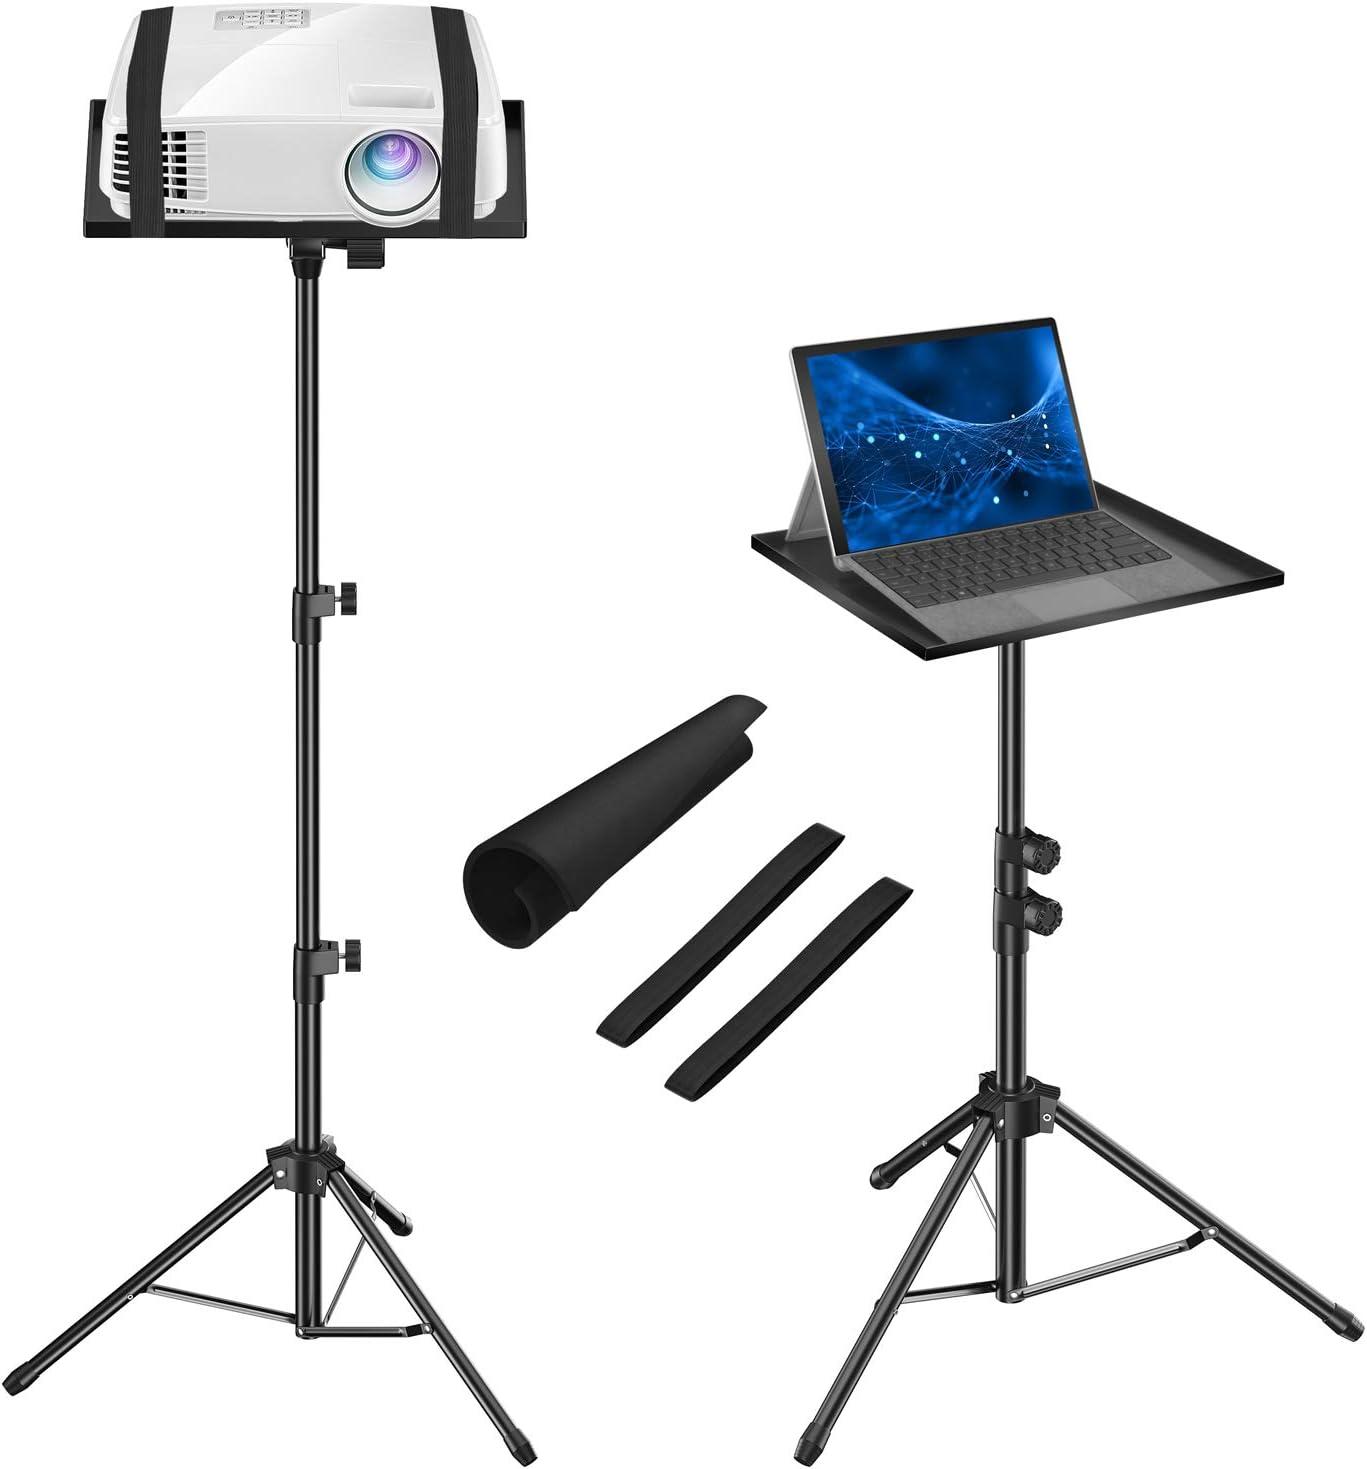 OUKMIC Universal Ranking Tucson Mall TOP12 Laptop Projector Tripod Stand O Portable Multi